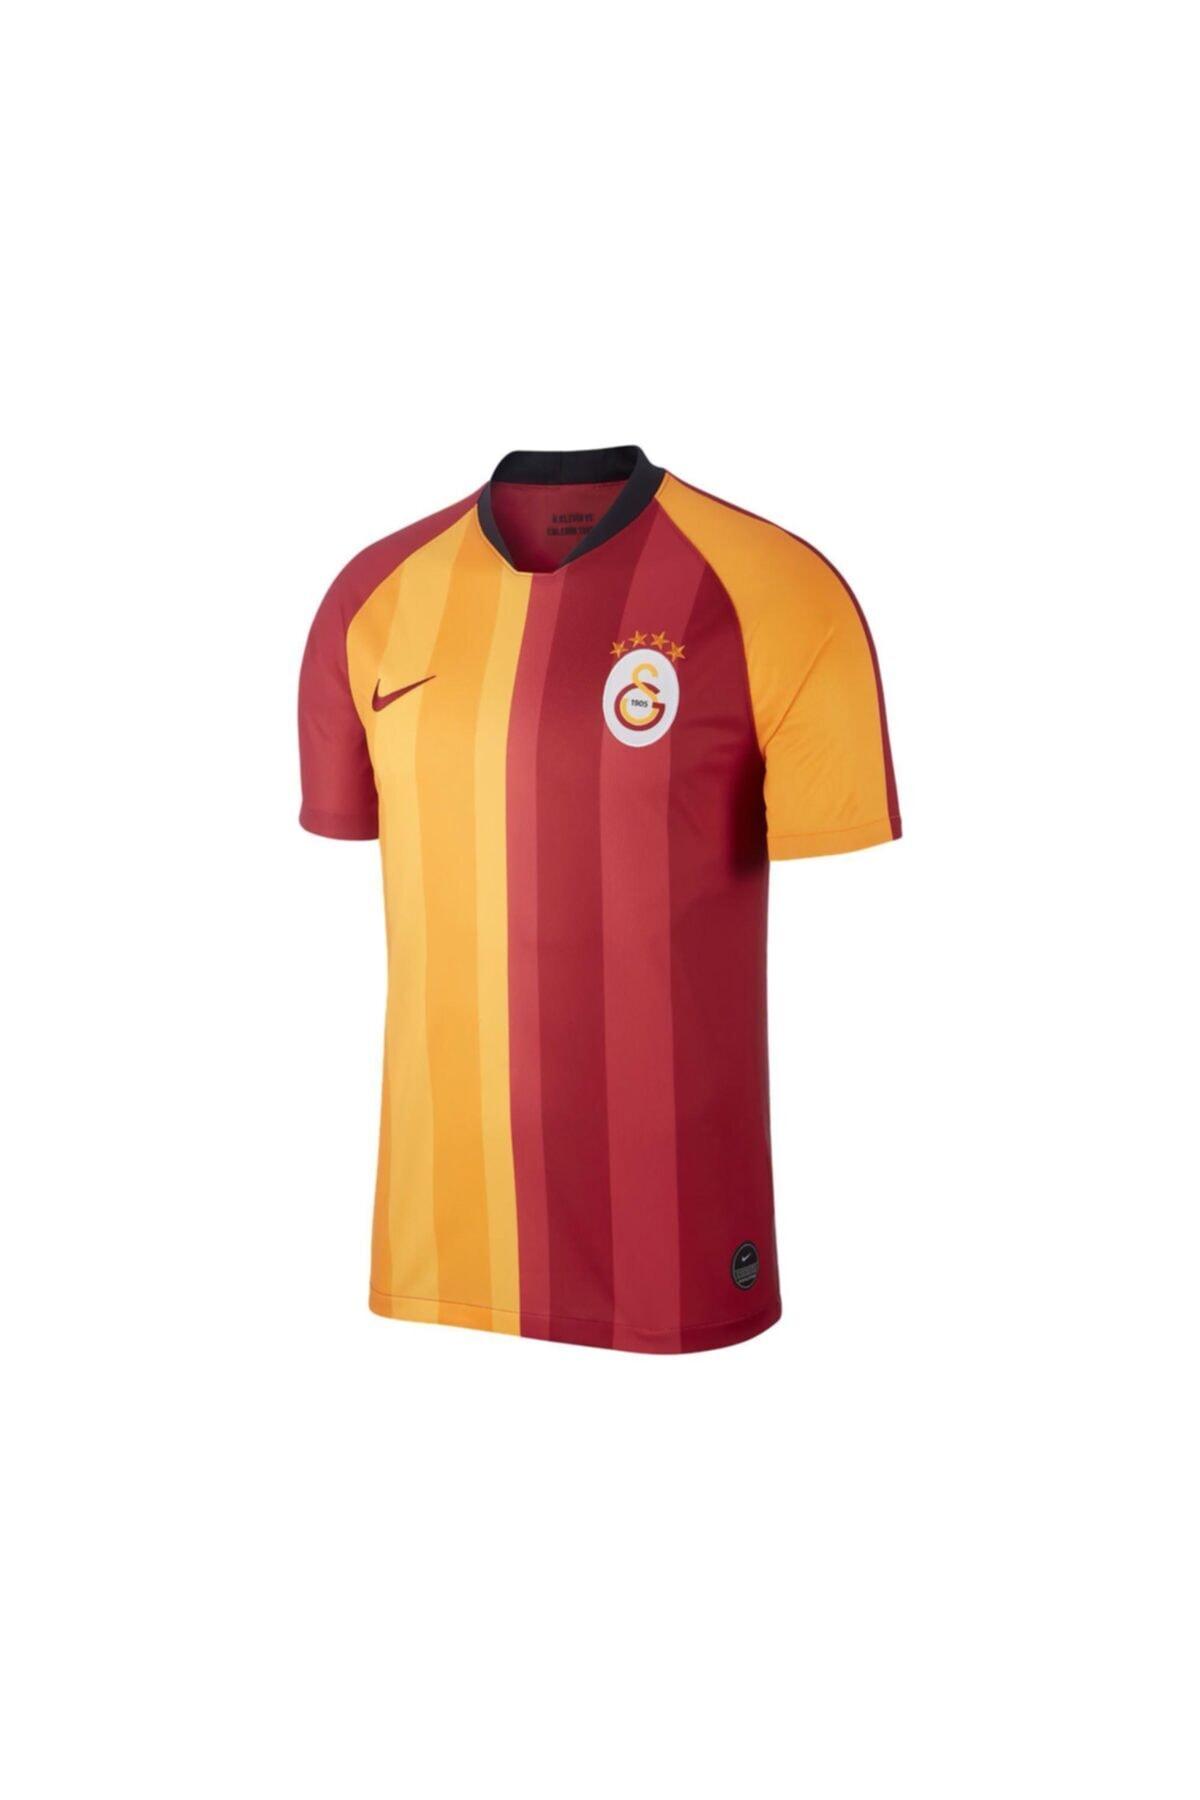 Erkek Galatasaray 19-20 Sezon Home Forma Aj5537-628